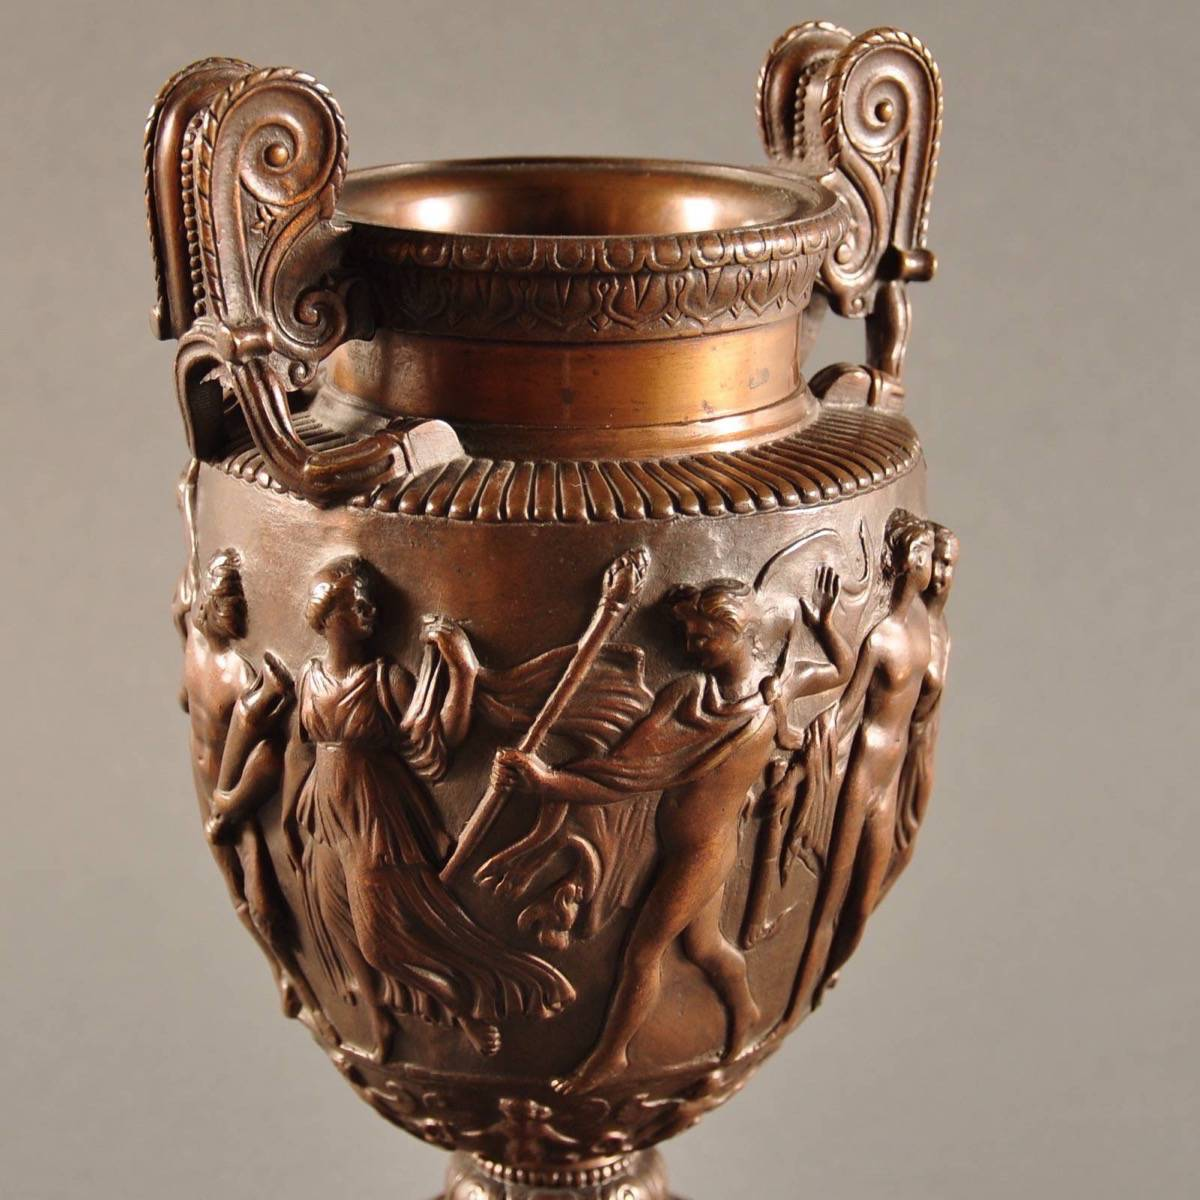 Roman volute krater vase de grande decorative object bronze vase in ancient roman style a so called volute krater reviewsmspy